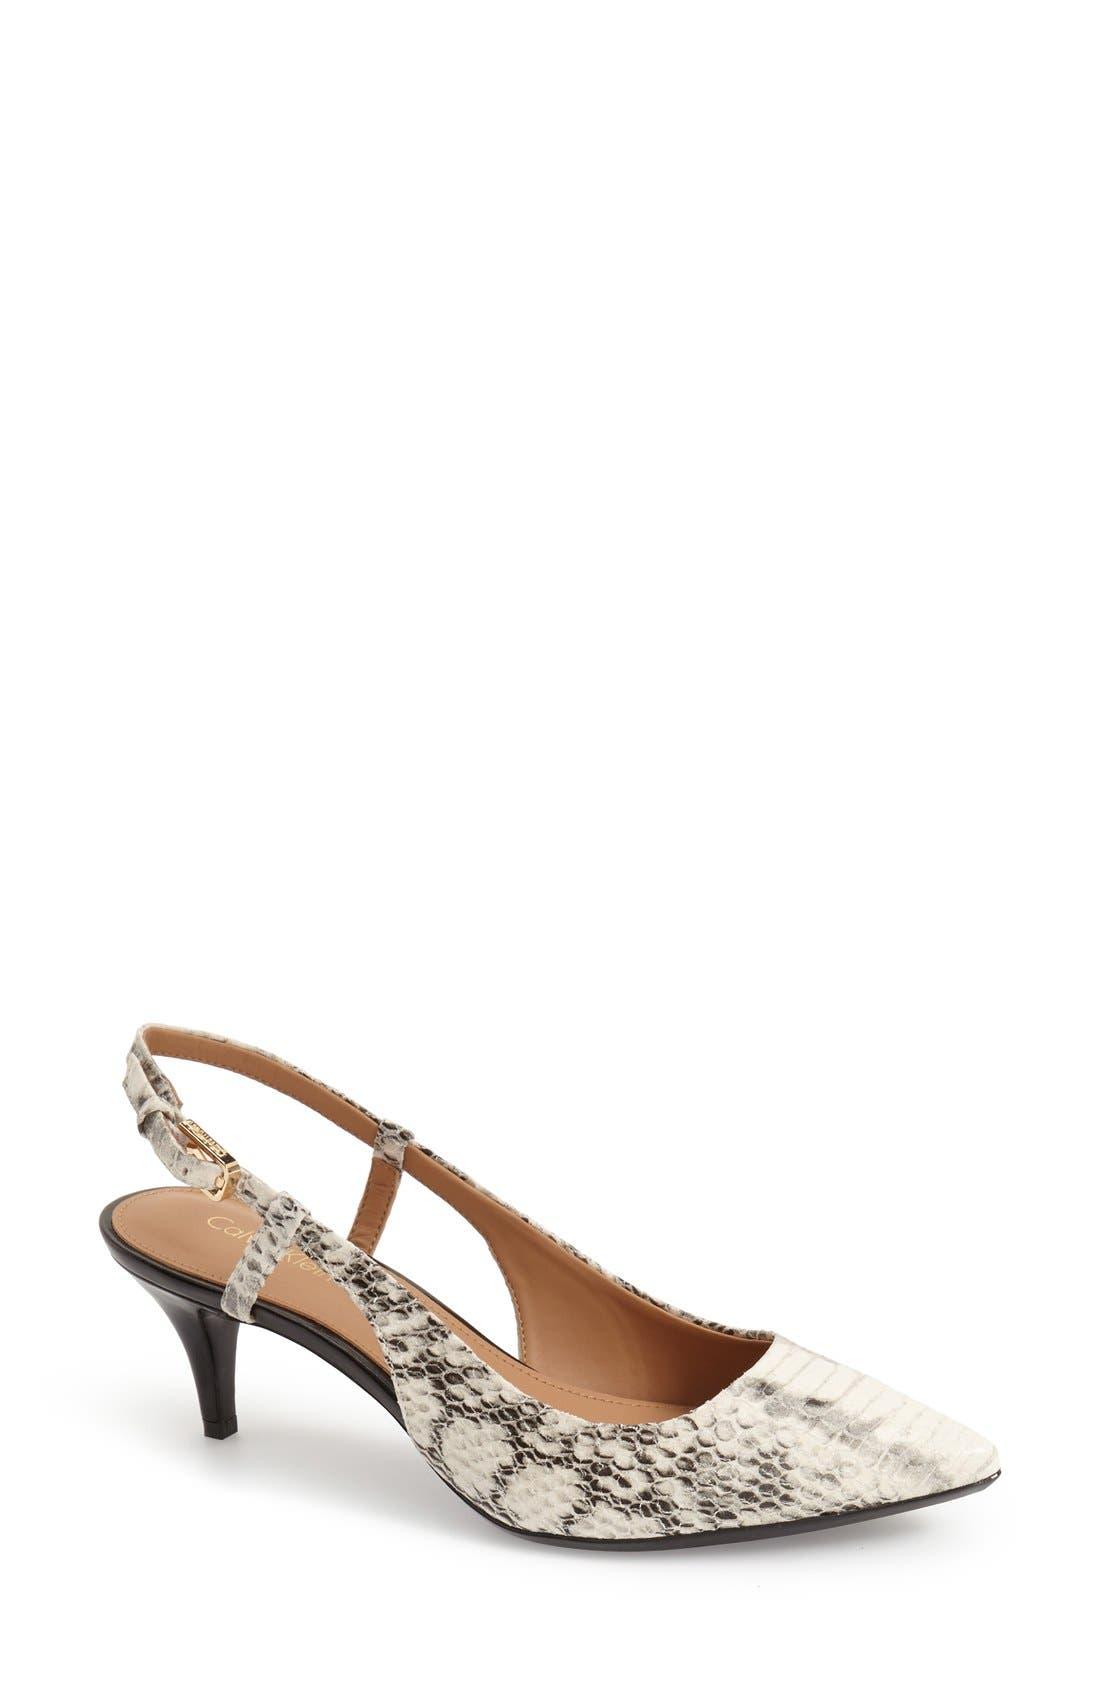 Main Image - Calvin Klein 'Patsi' Slingback Pointy Toe Pump (Women)